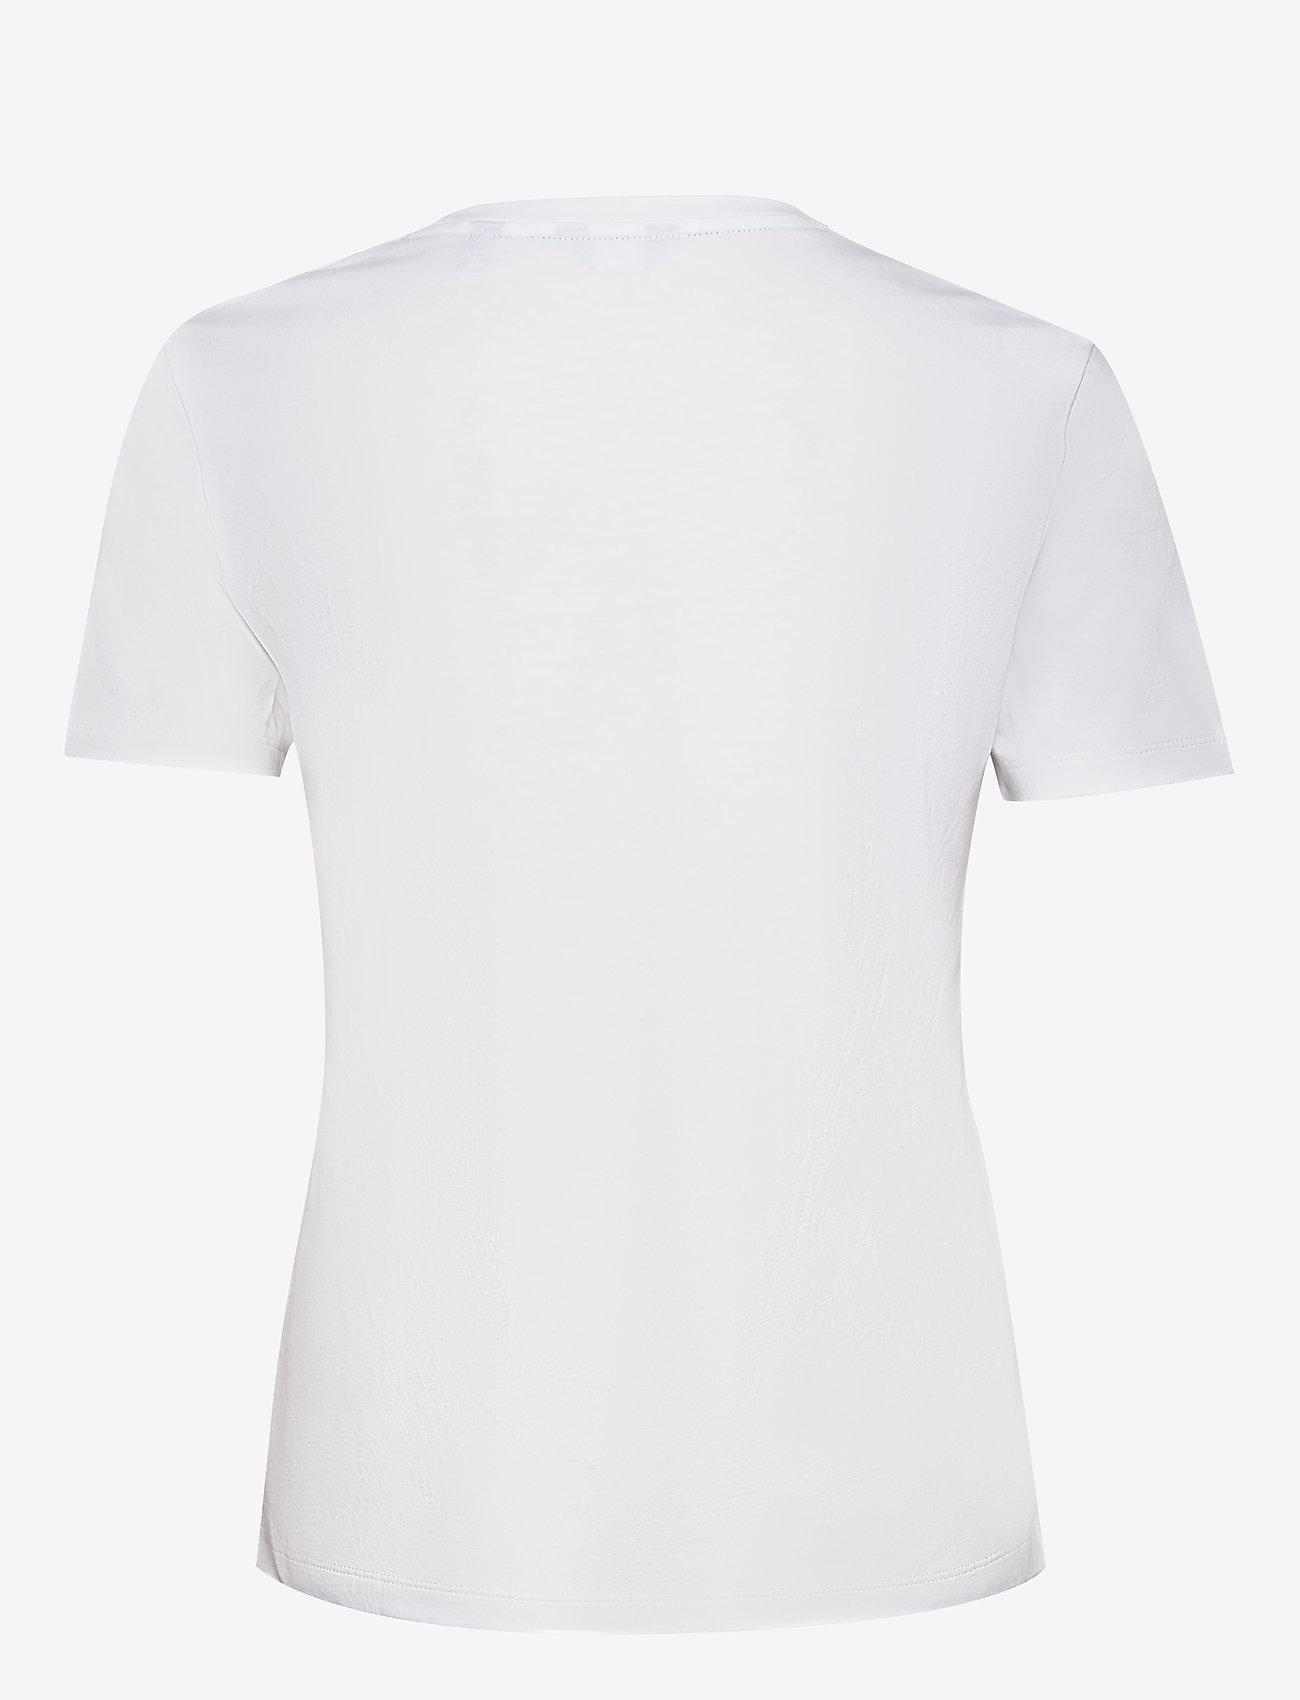 GANT - D1. 13 STRIPES SS T-SHIRT - t-shirts - white - 1